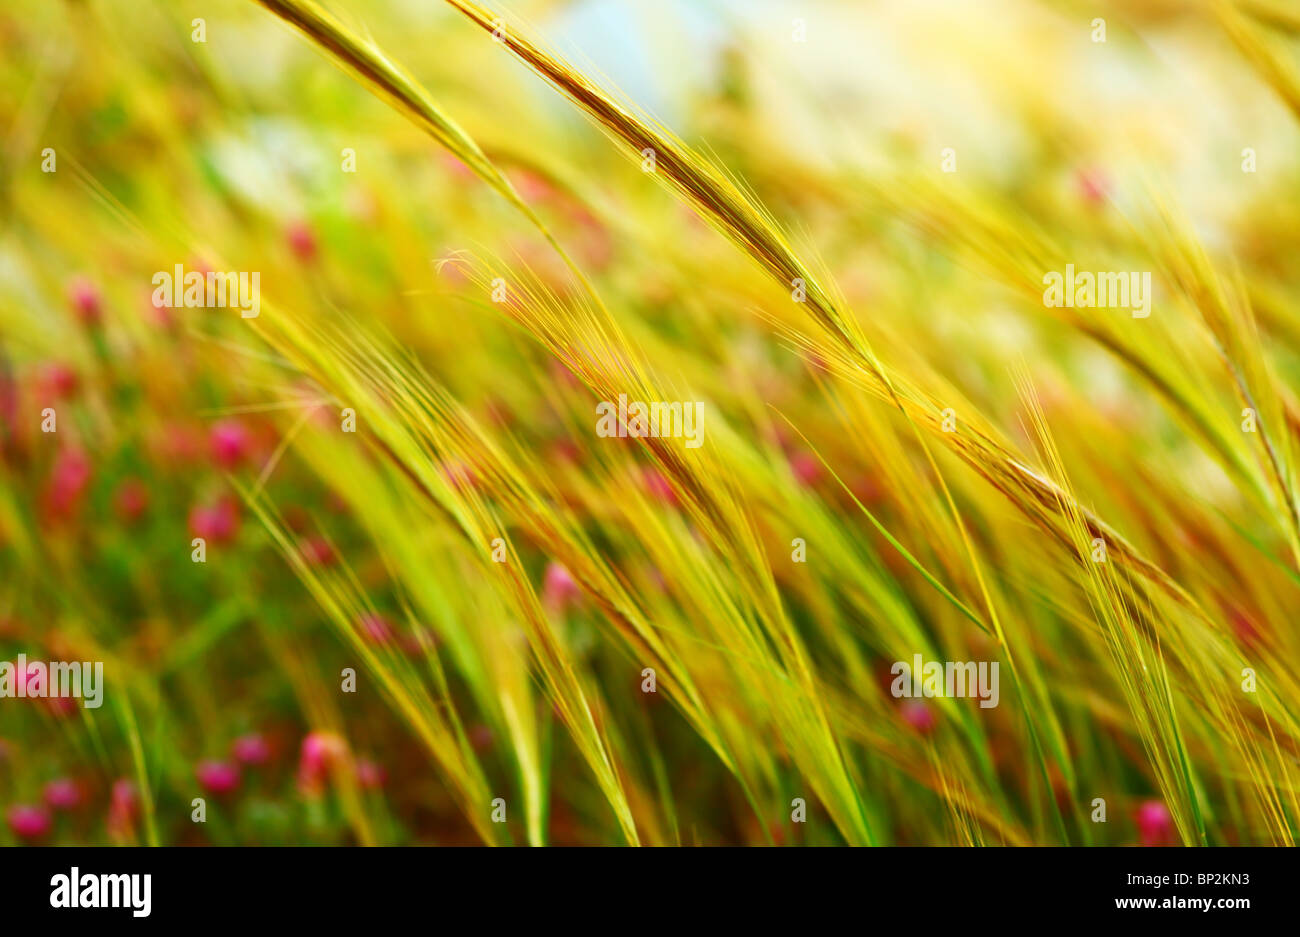 Wheat field landscape late summer scene - Stock Image